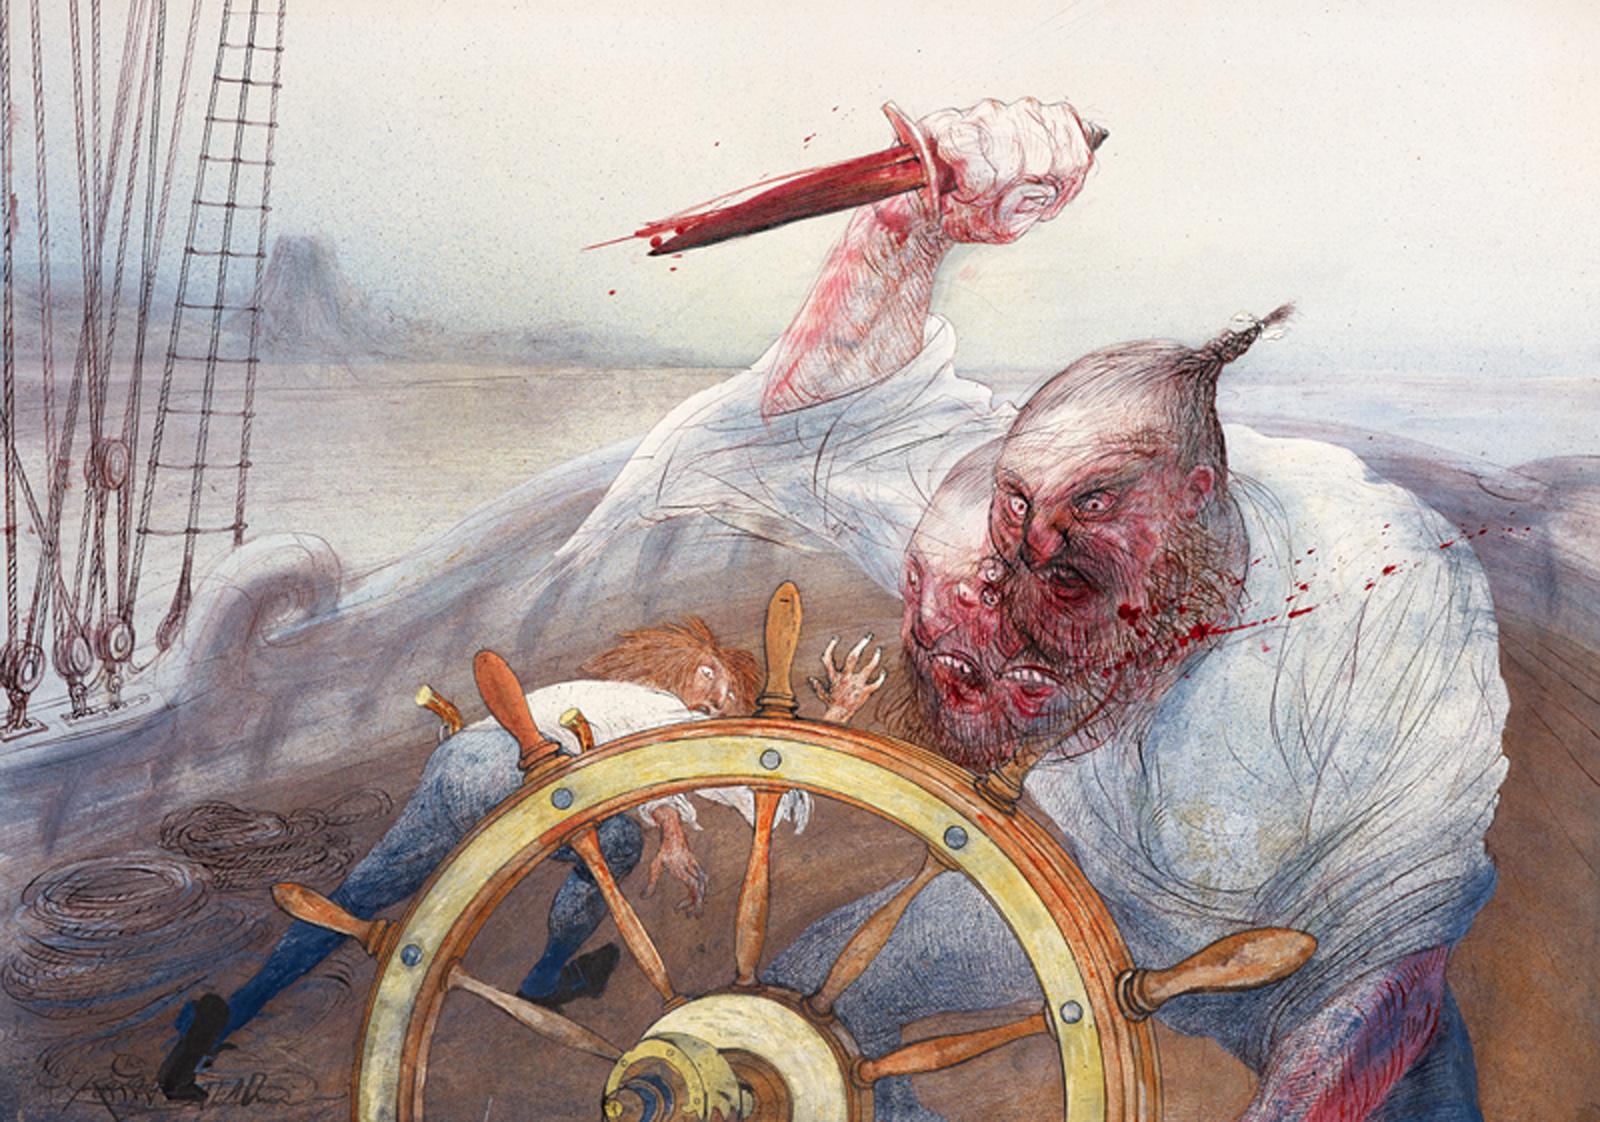 Ralph Steadman's illustrated version of Treasure Island